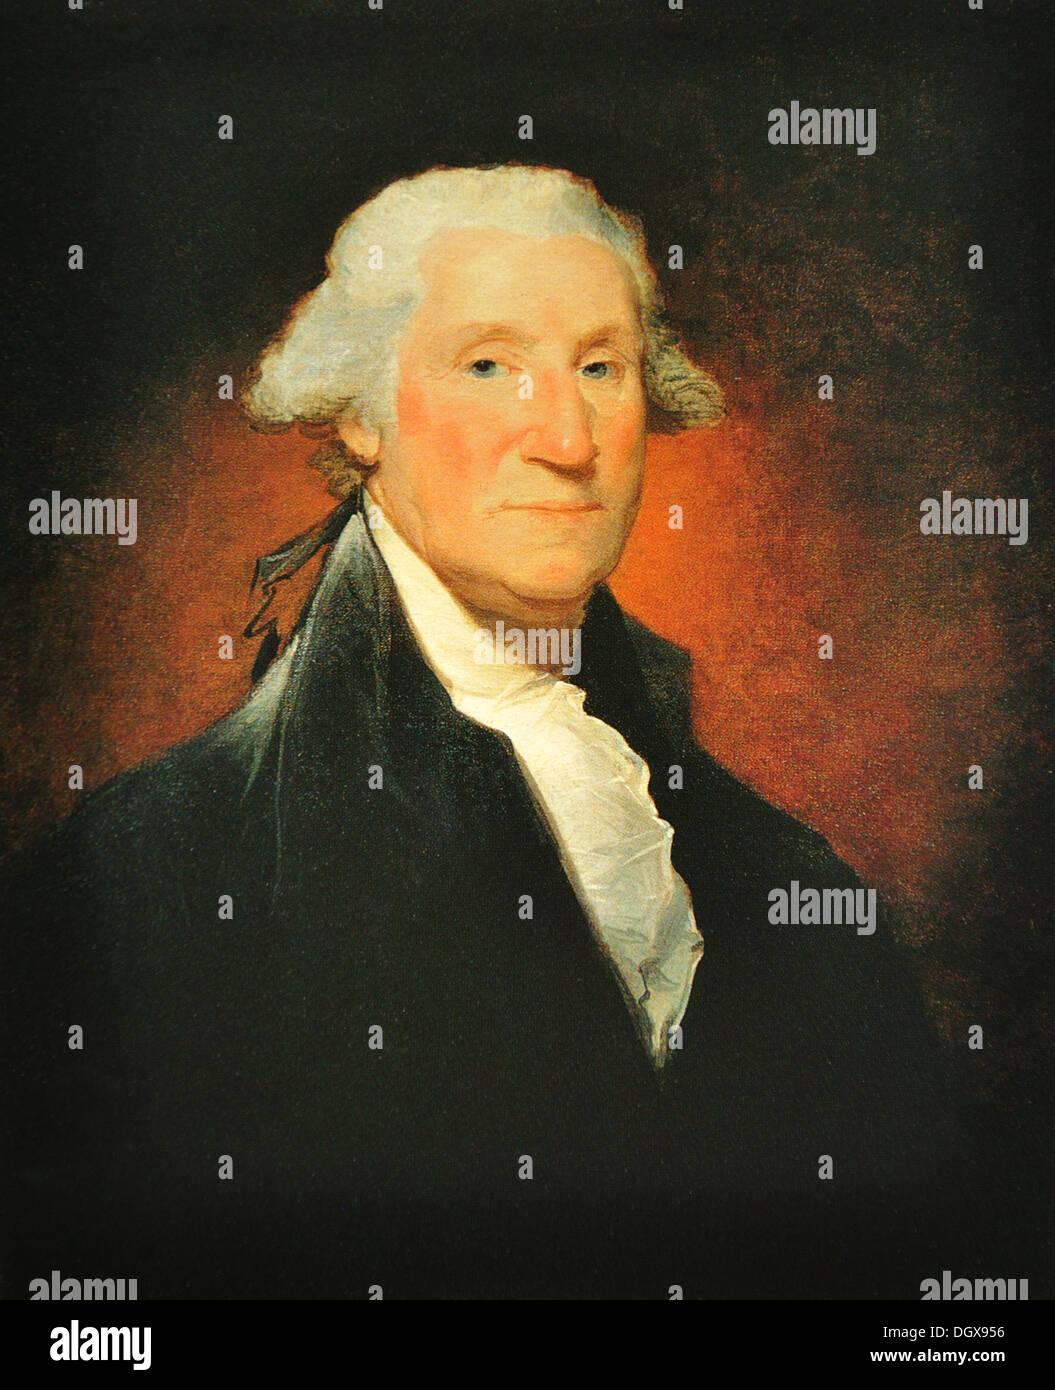 Vaughan Portrait of George Washington - by Gilbert Stuart, 1795 Stock Photo